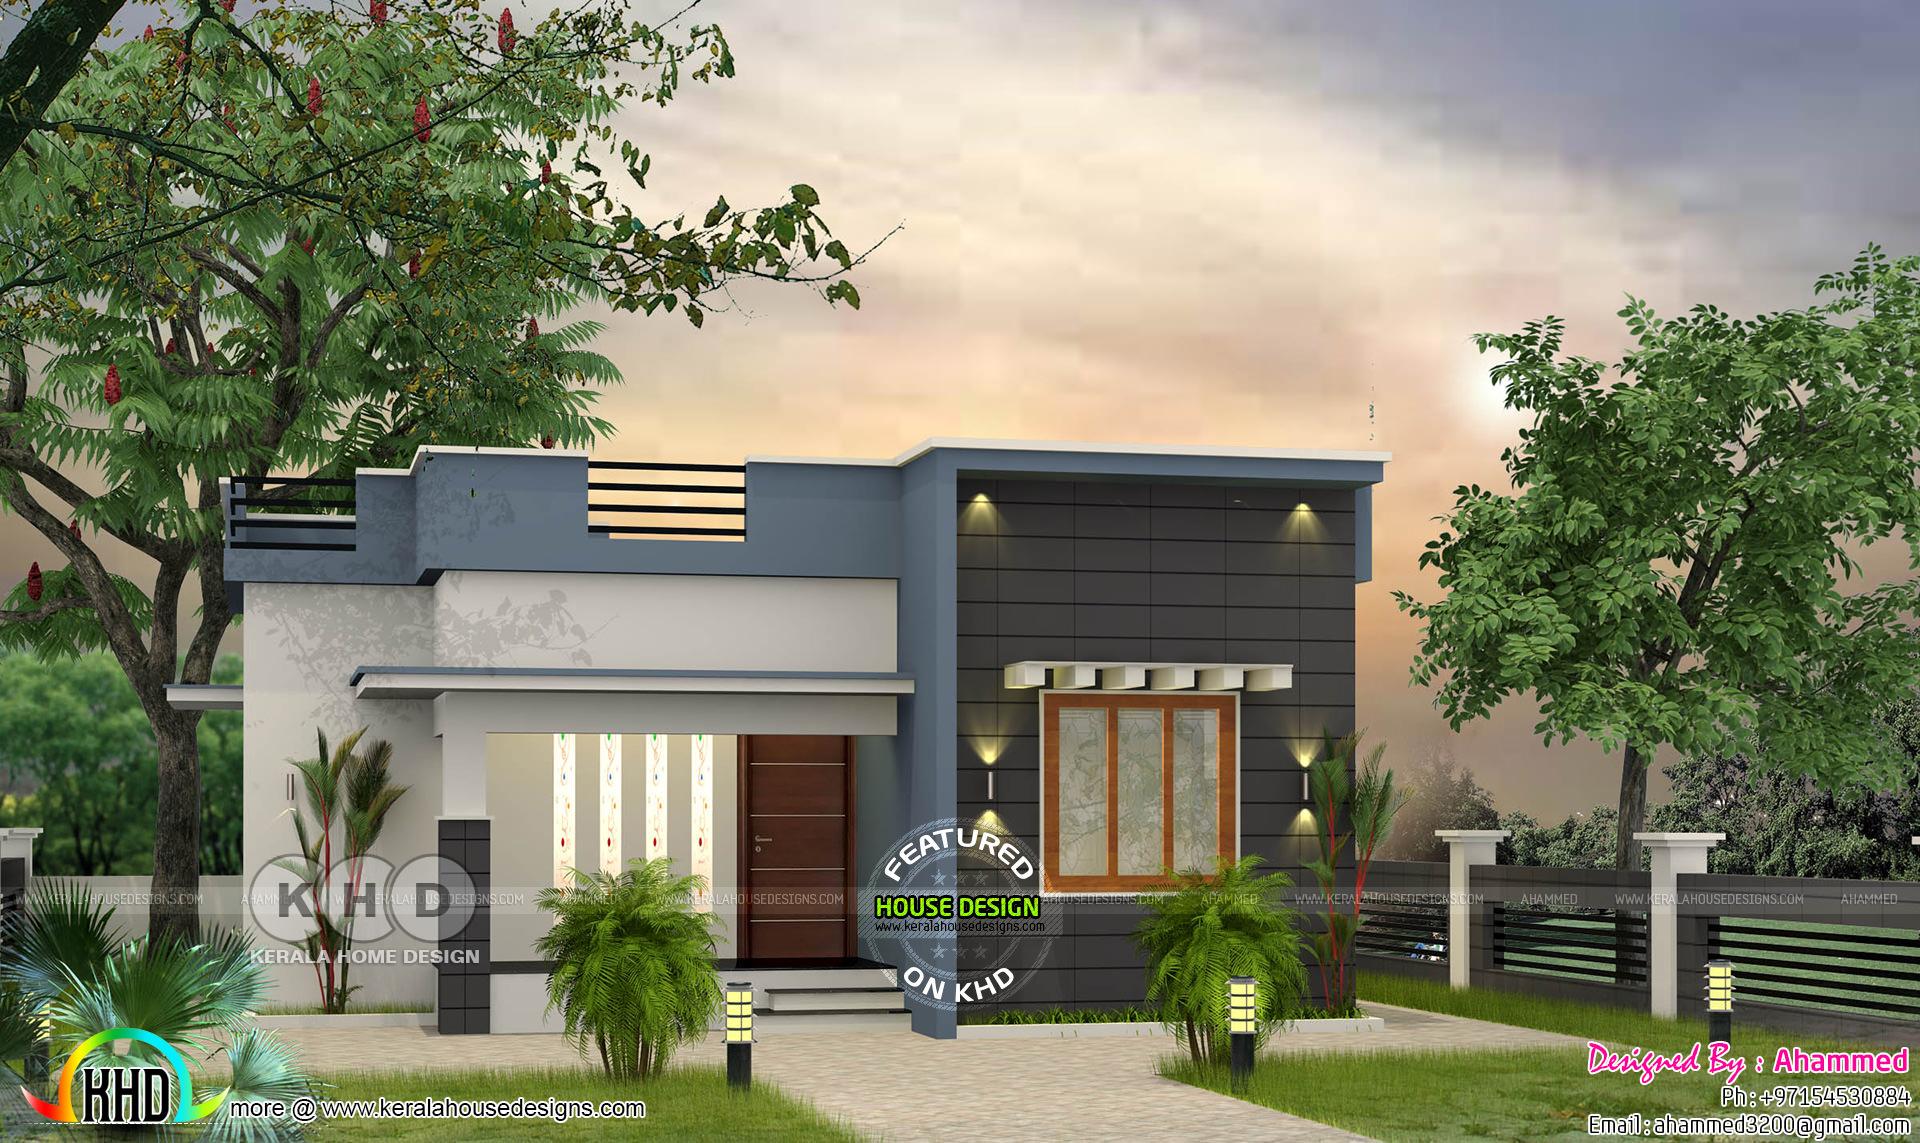 Low budget flat roof 2 bedroom house 700 sqft  Kerala